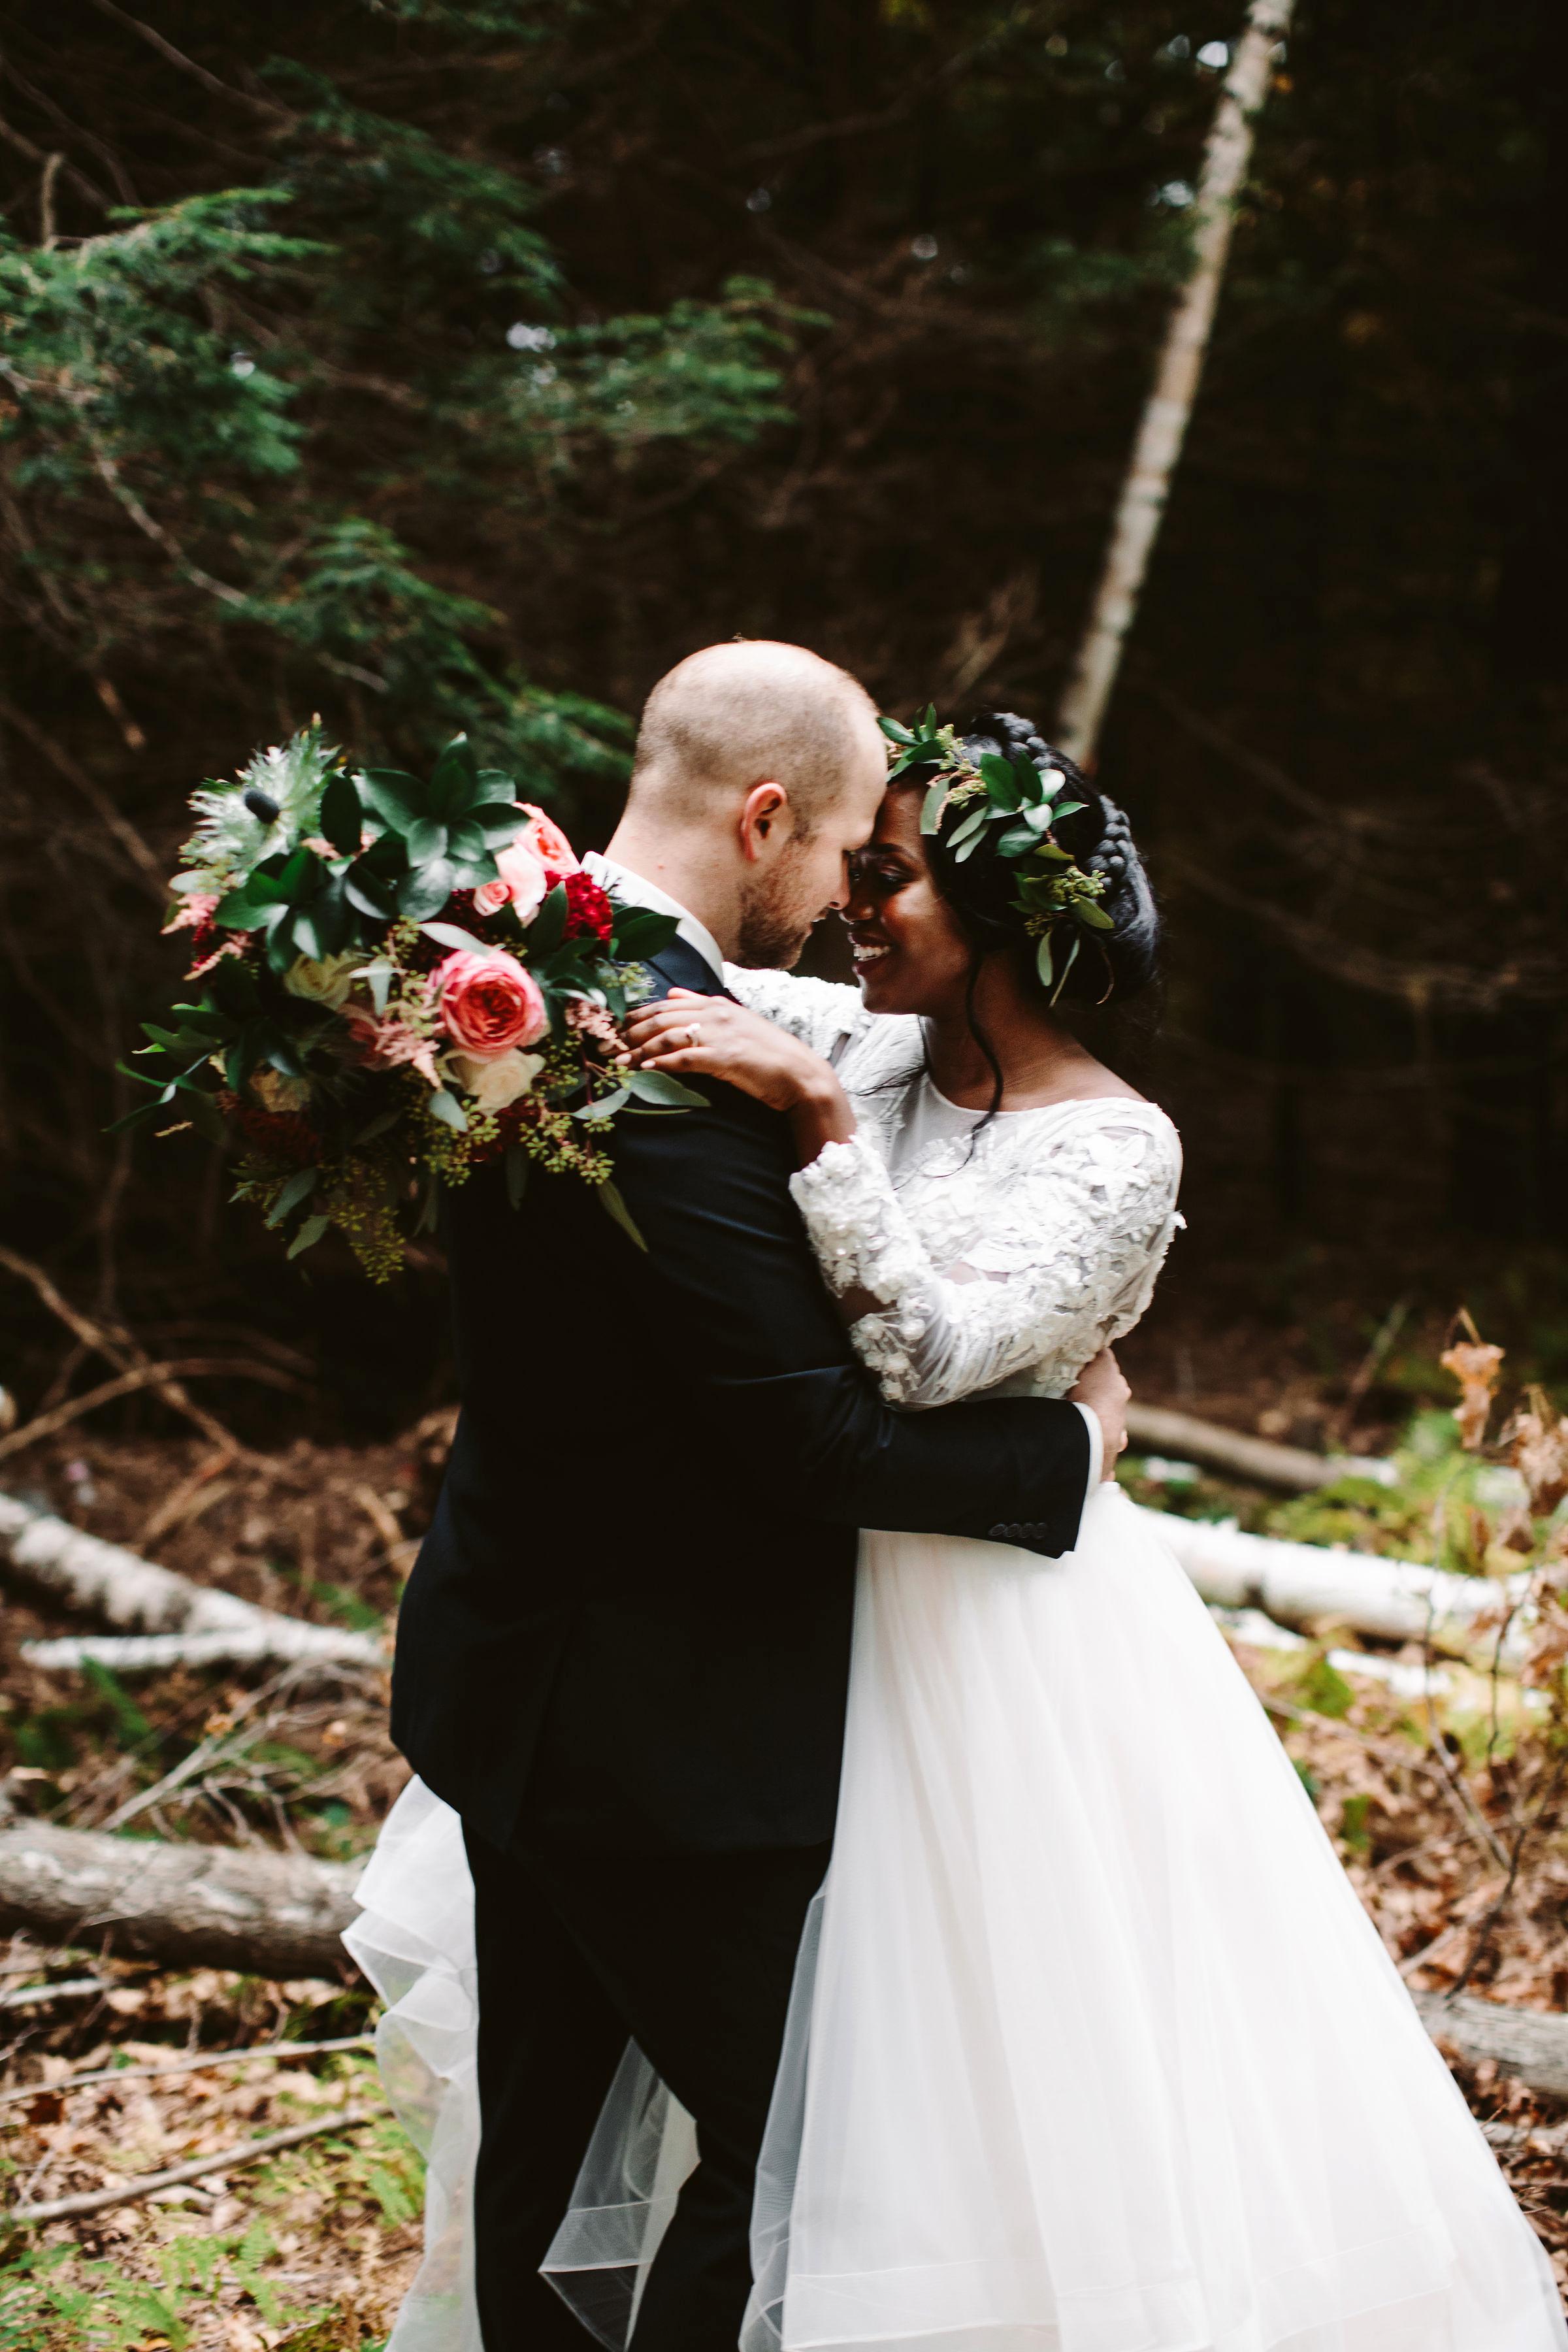 rivka aaron wedding couple bride groom hugging outdoors